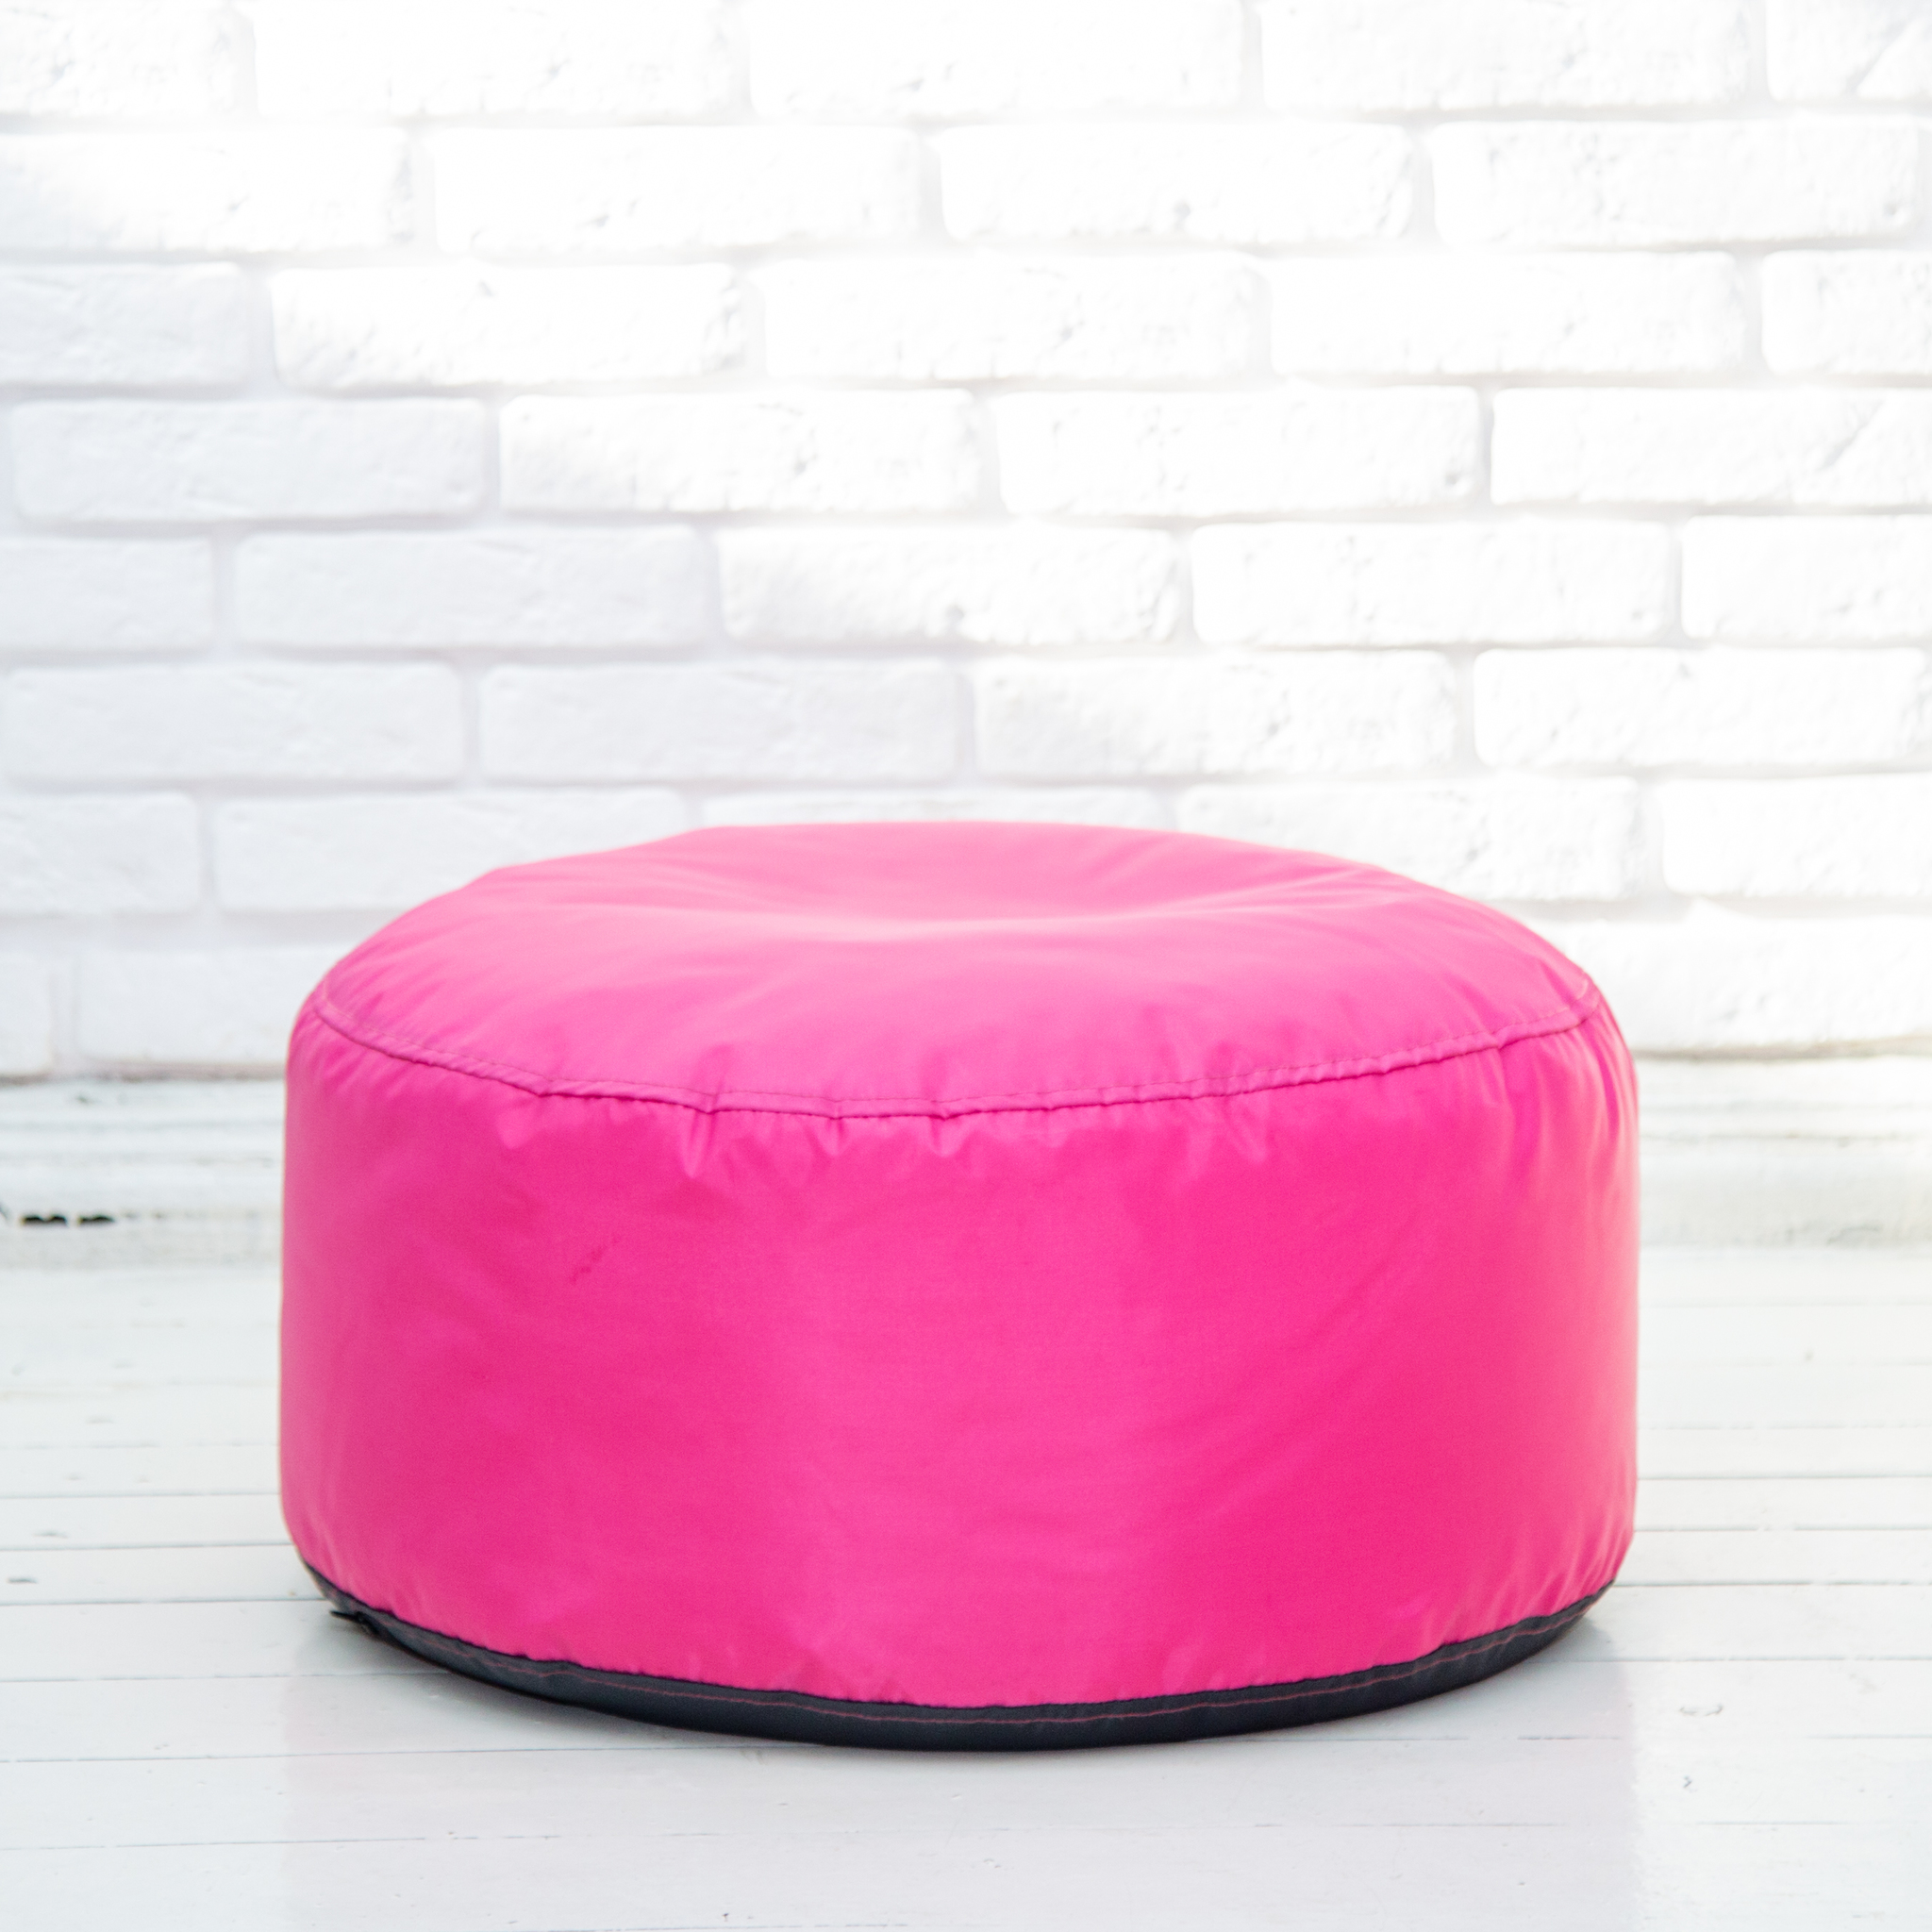 Таблетка розовая